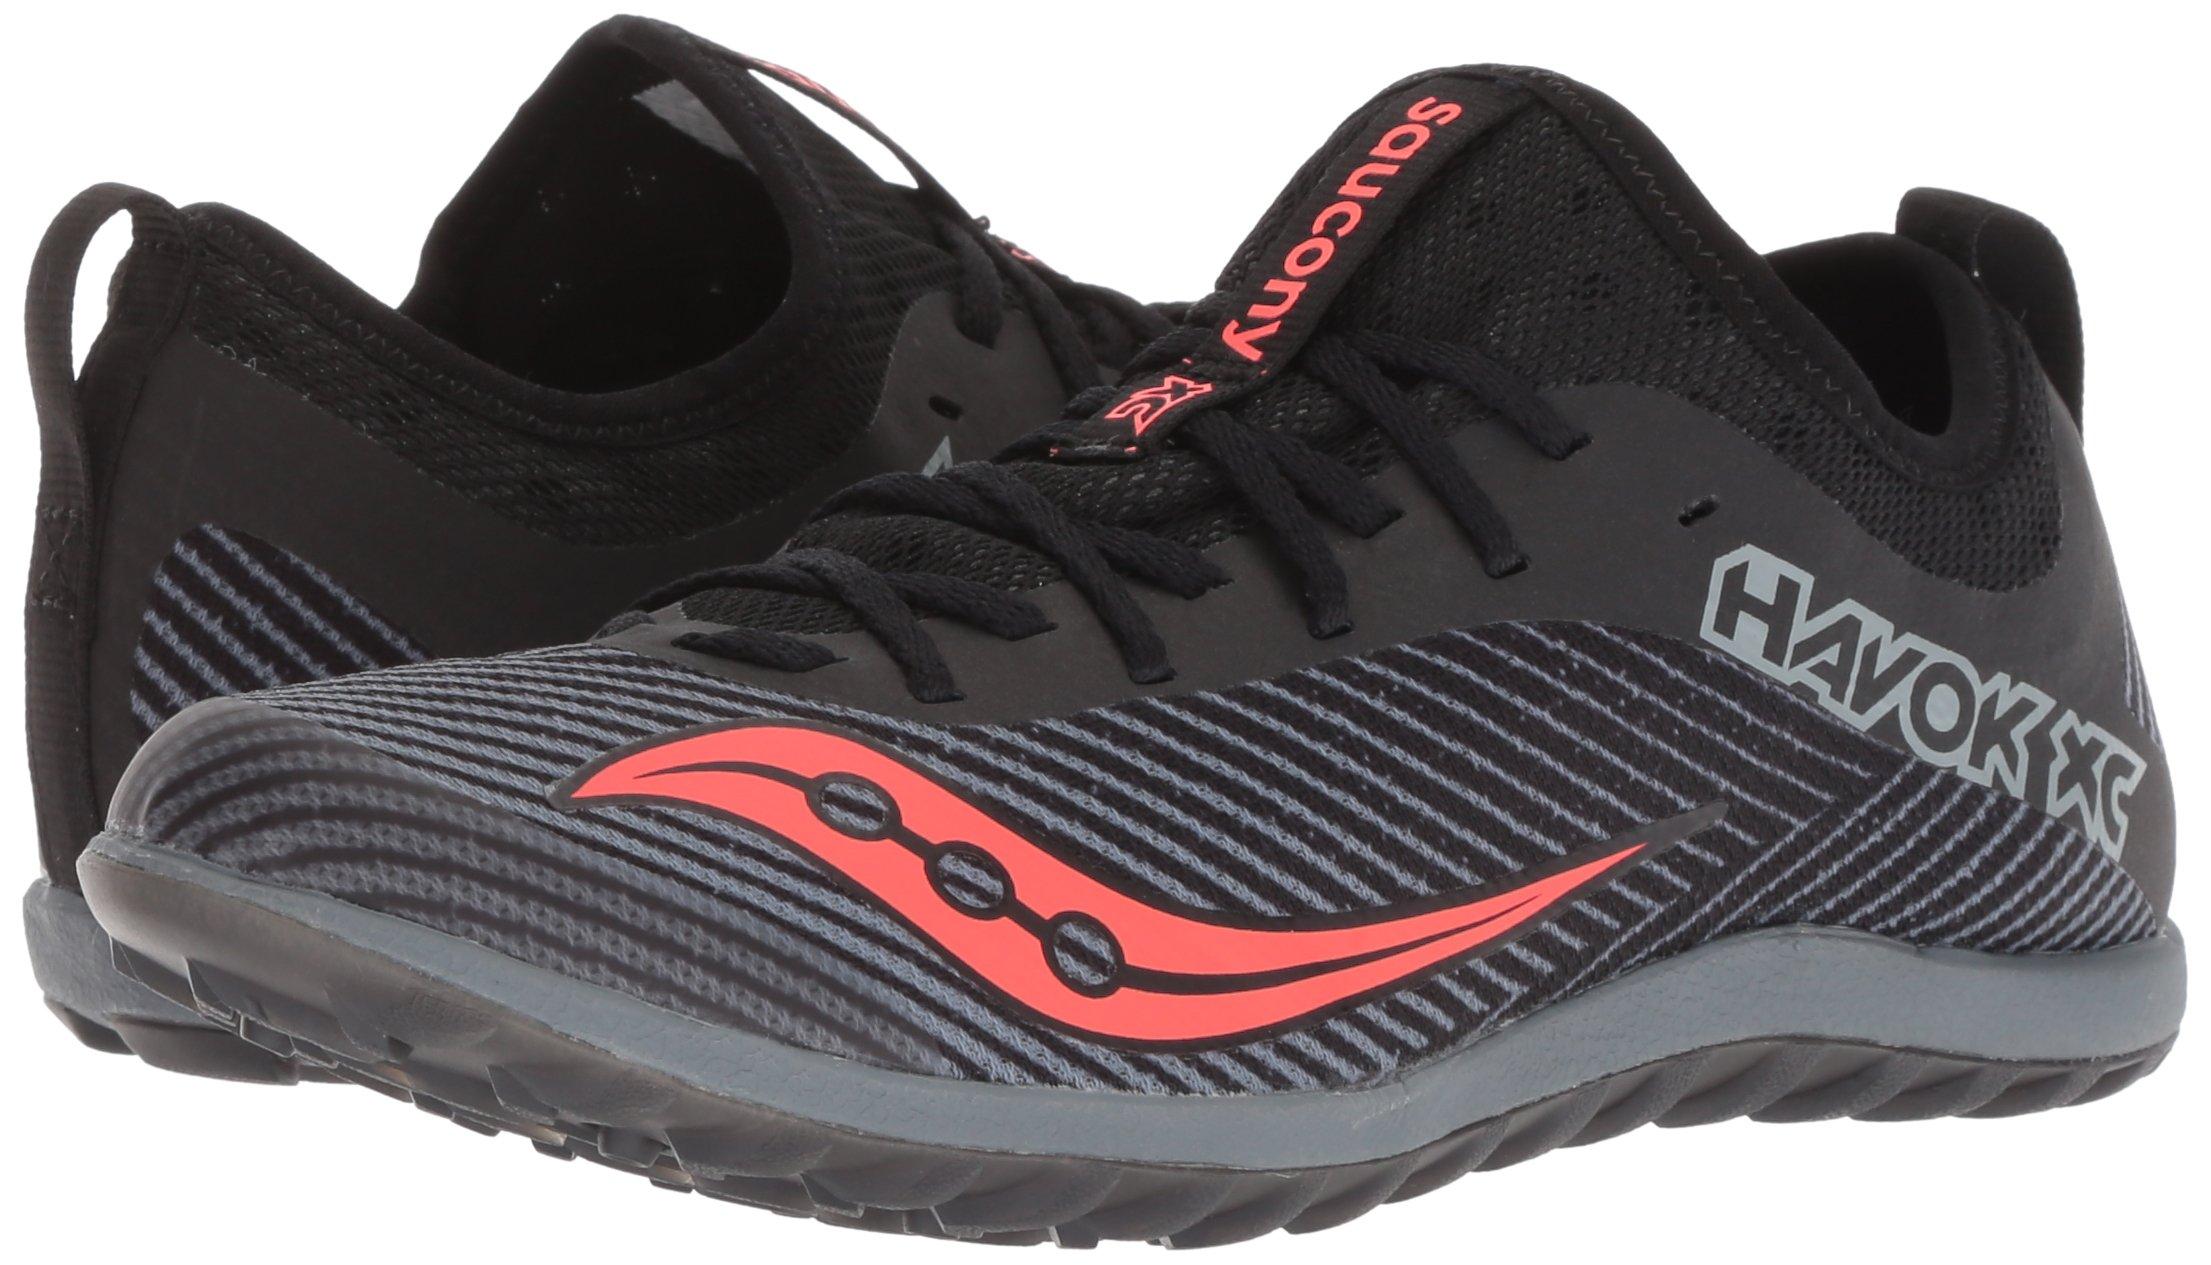 Saucony Women's Havok XC2 Flat Track Shoe Black/Grey/Vizi-red 7 M US by Saucony (Image #5)